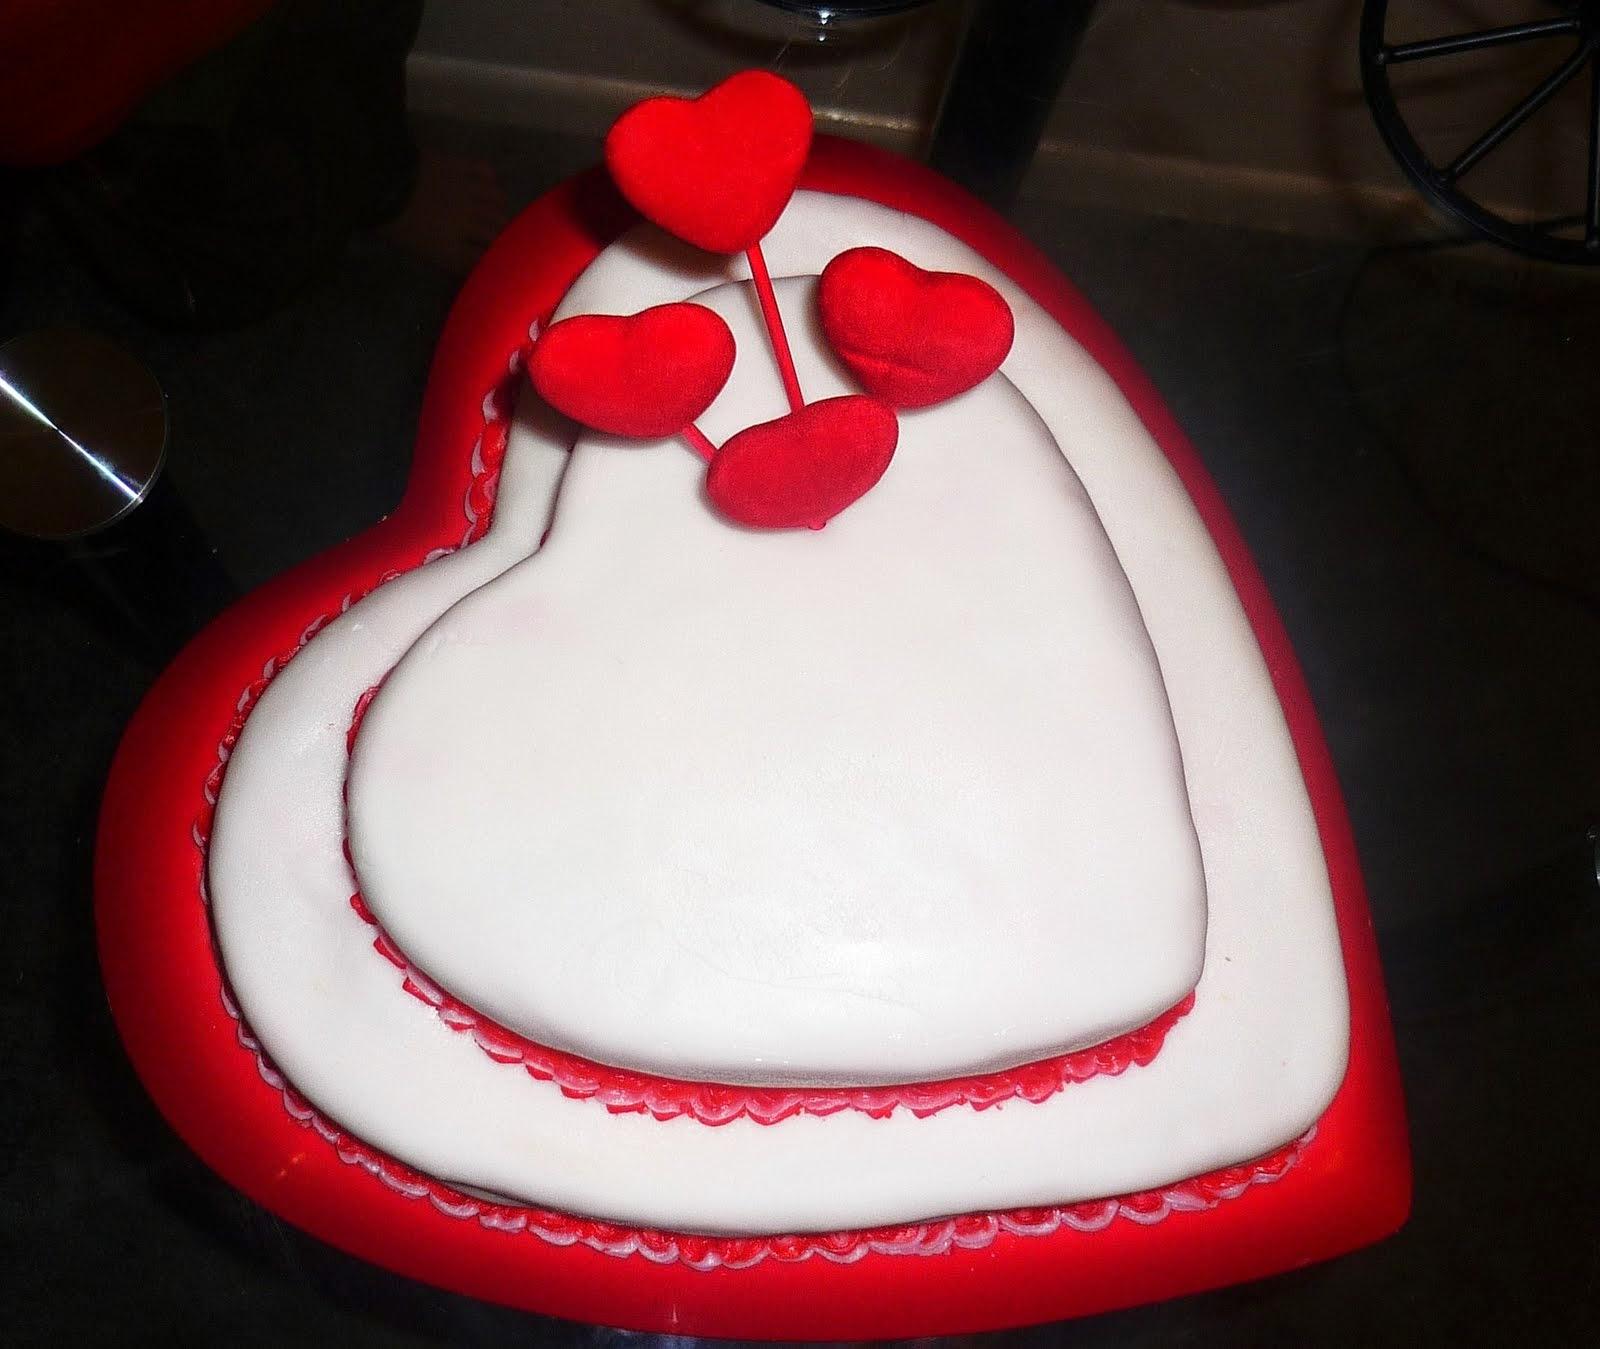 Love Birthday cake Wallpaper : HD BIRTHDAY WALLPAPER : Birthday cakes